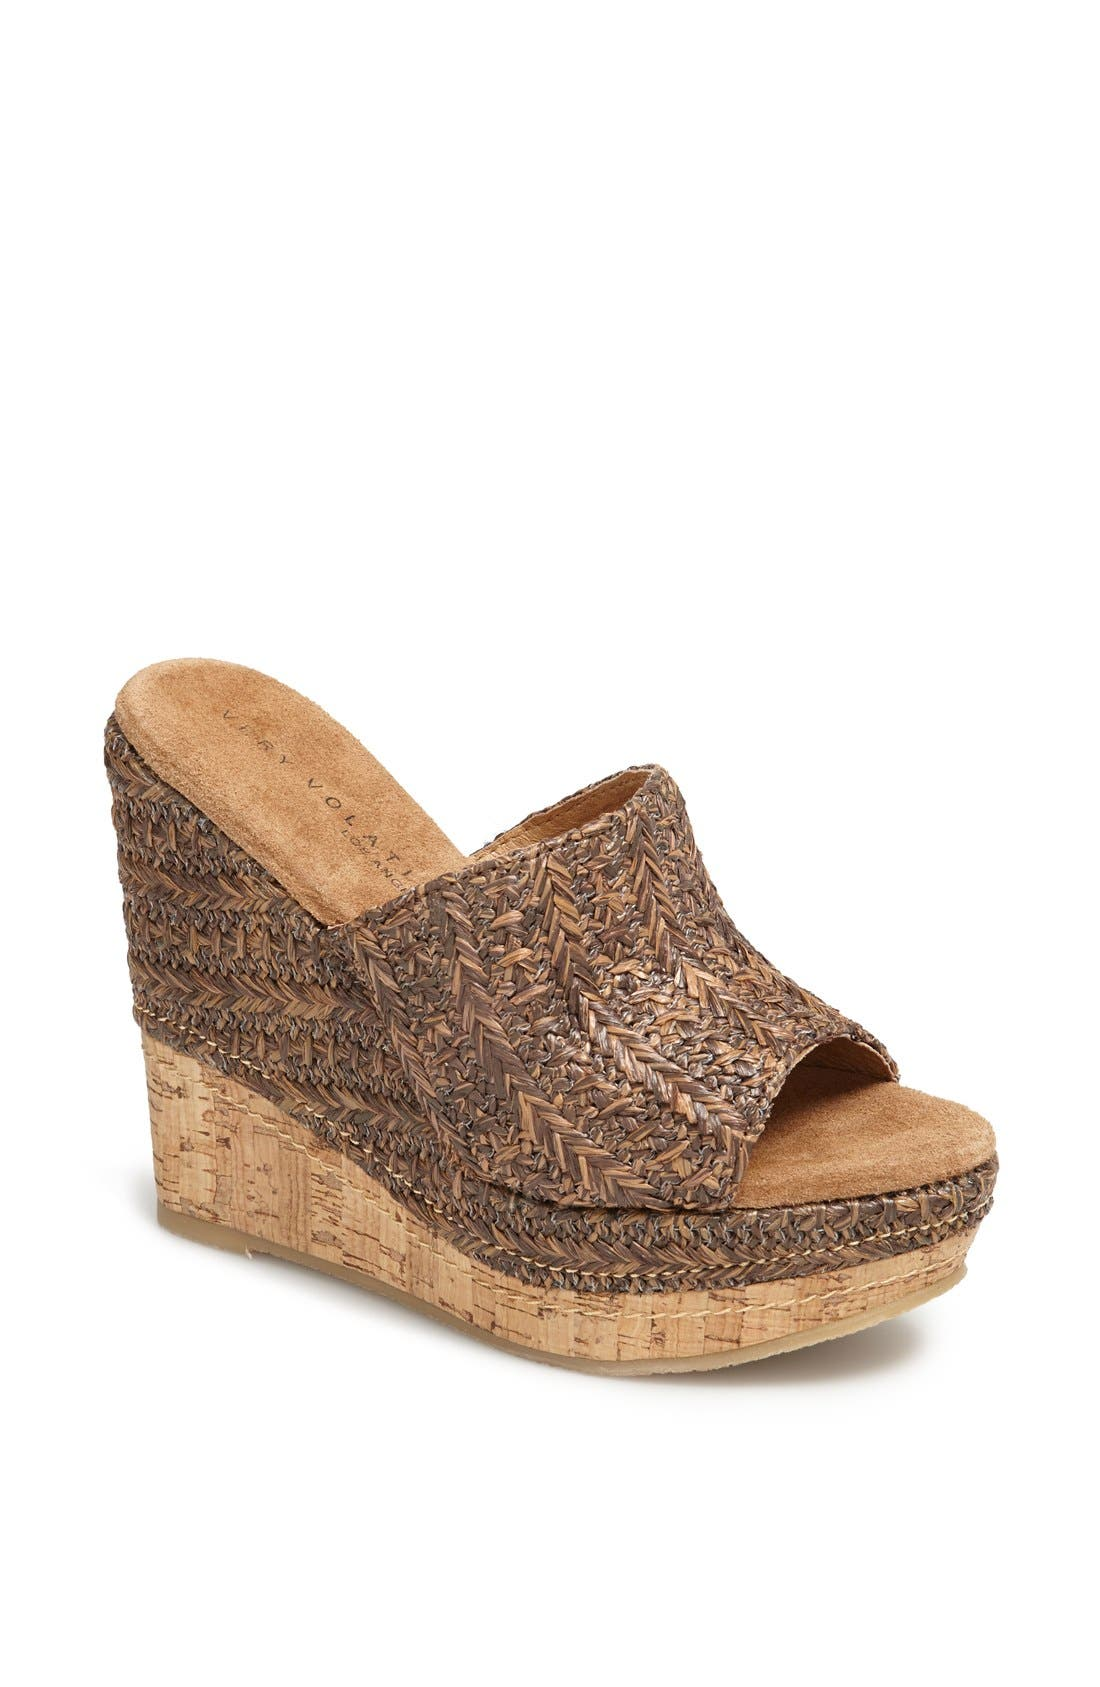 Main Image - Very Volatile 'Sandstone' Wedge Sandal